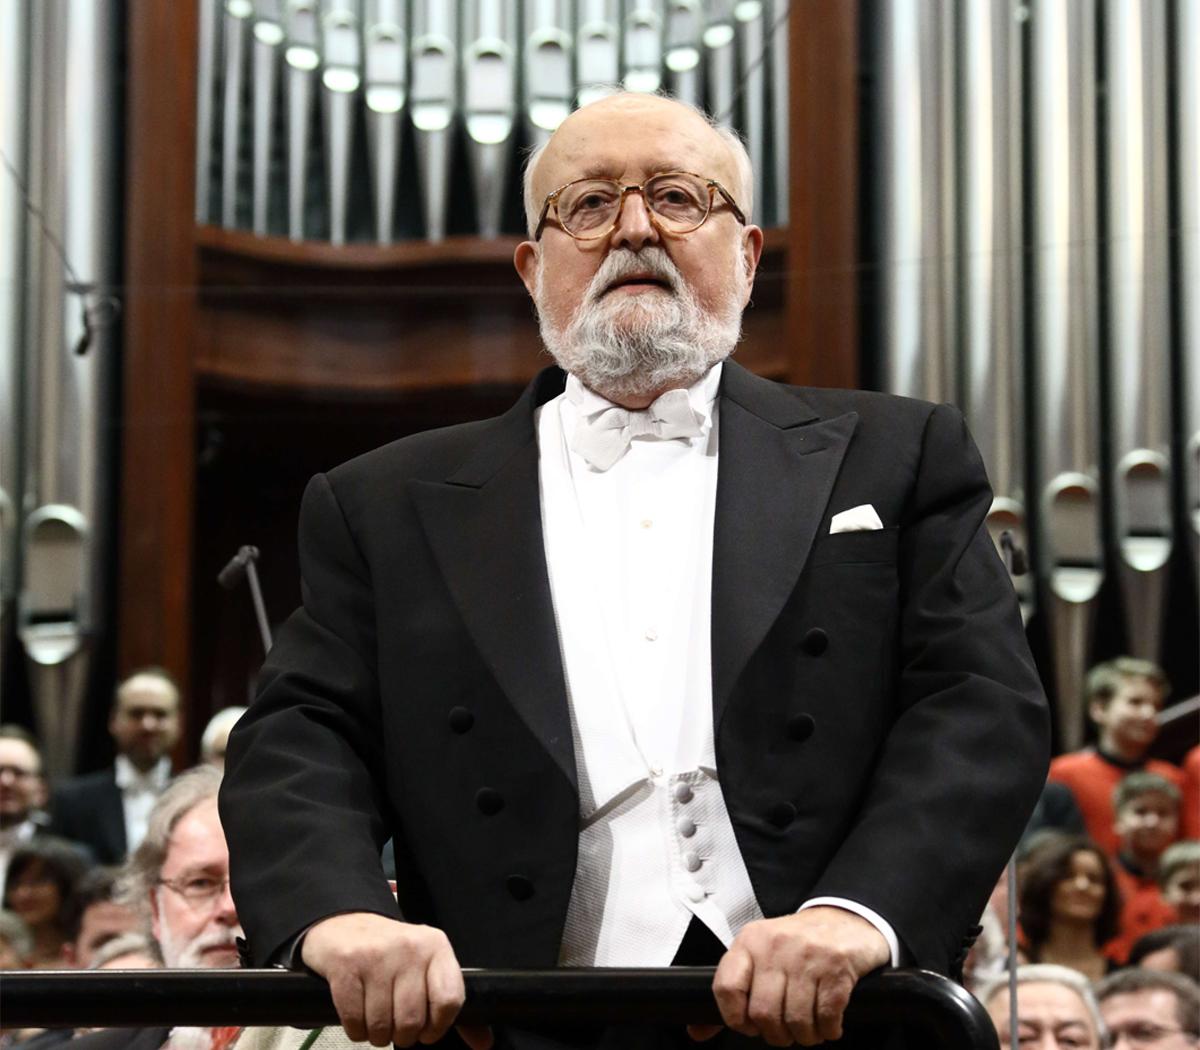 Wybitny kompozytor, dyrygent, pedagog muzyczny